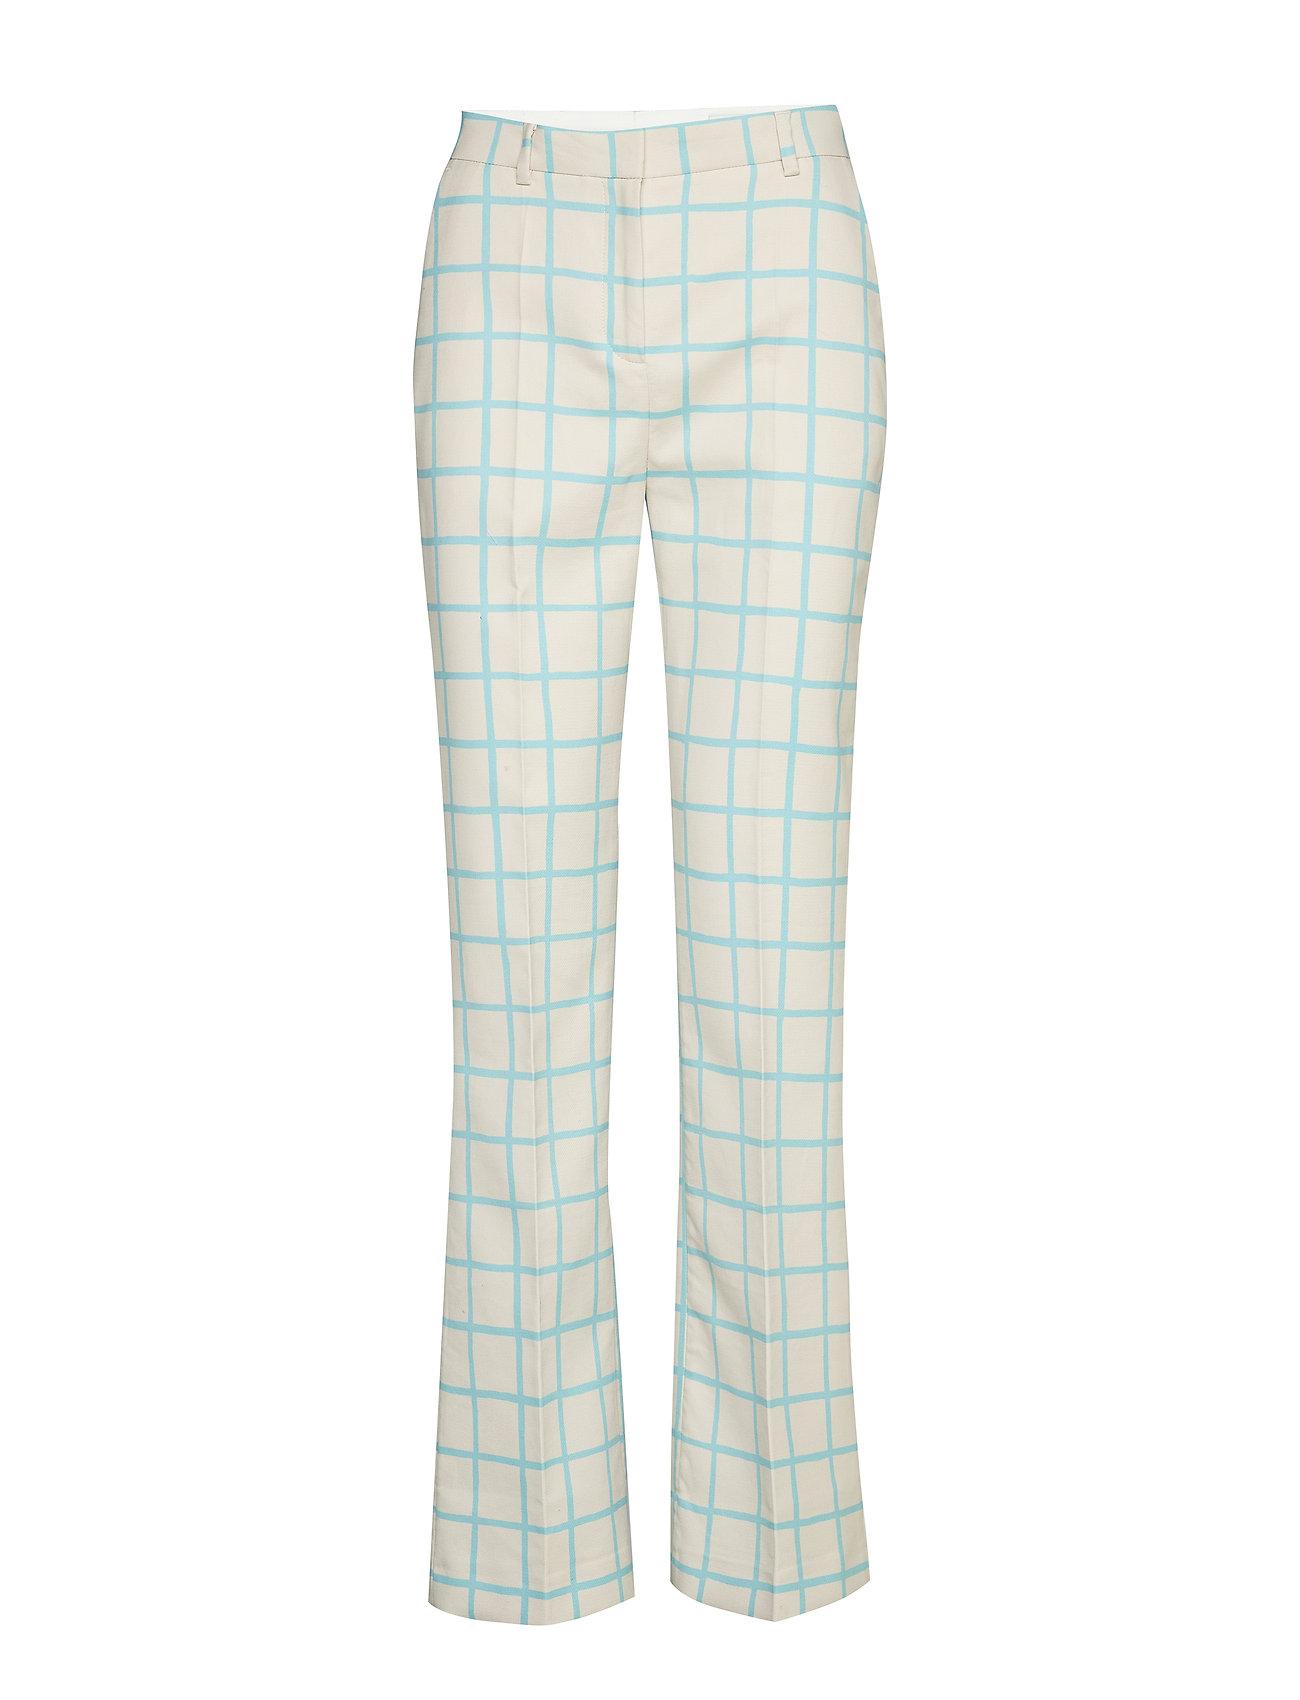 Image of Laatta Iso Ruutu Trousers Bukser Med Lige Ben Creme Marimekko (3423452073)